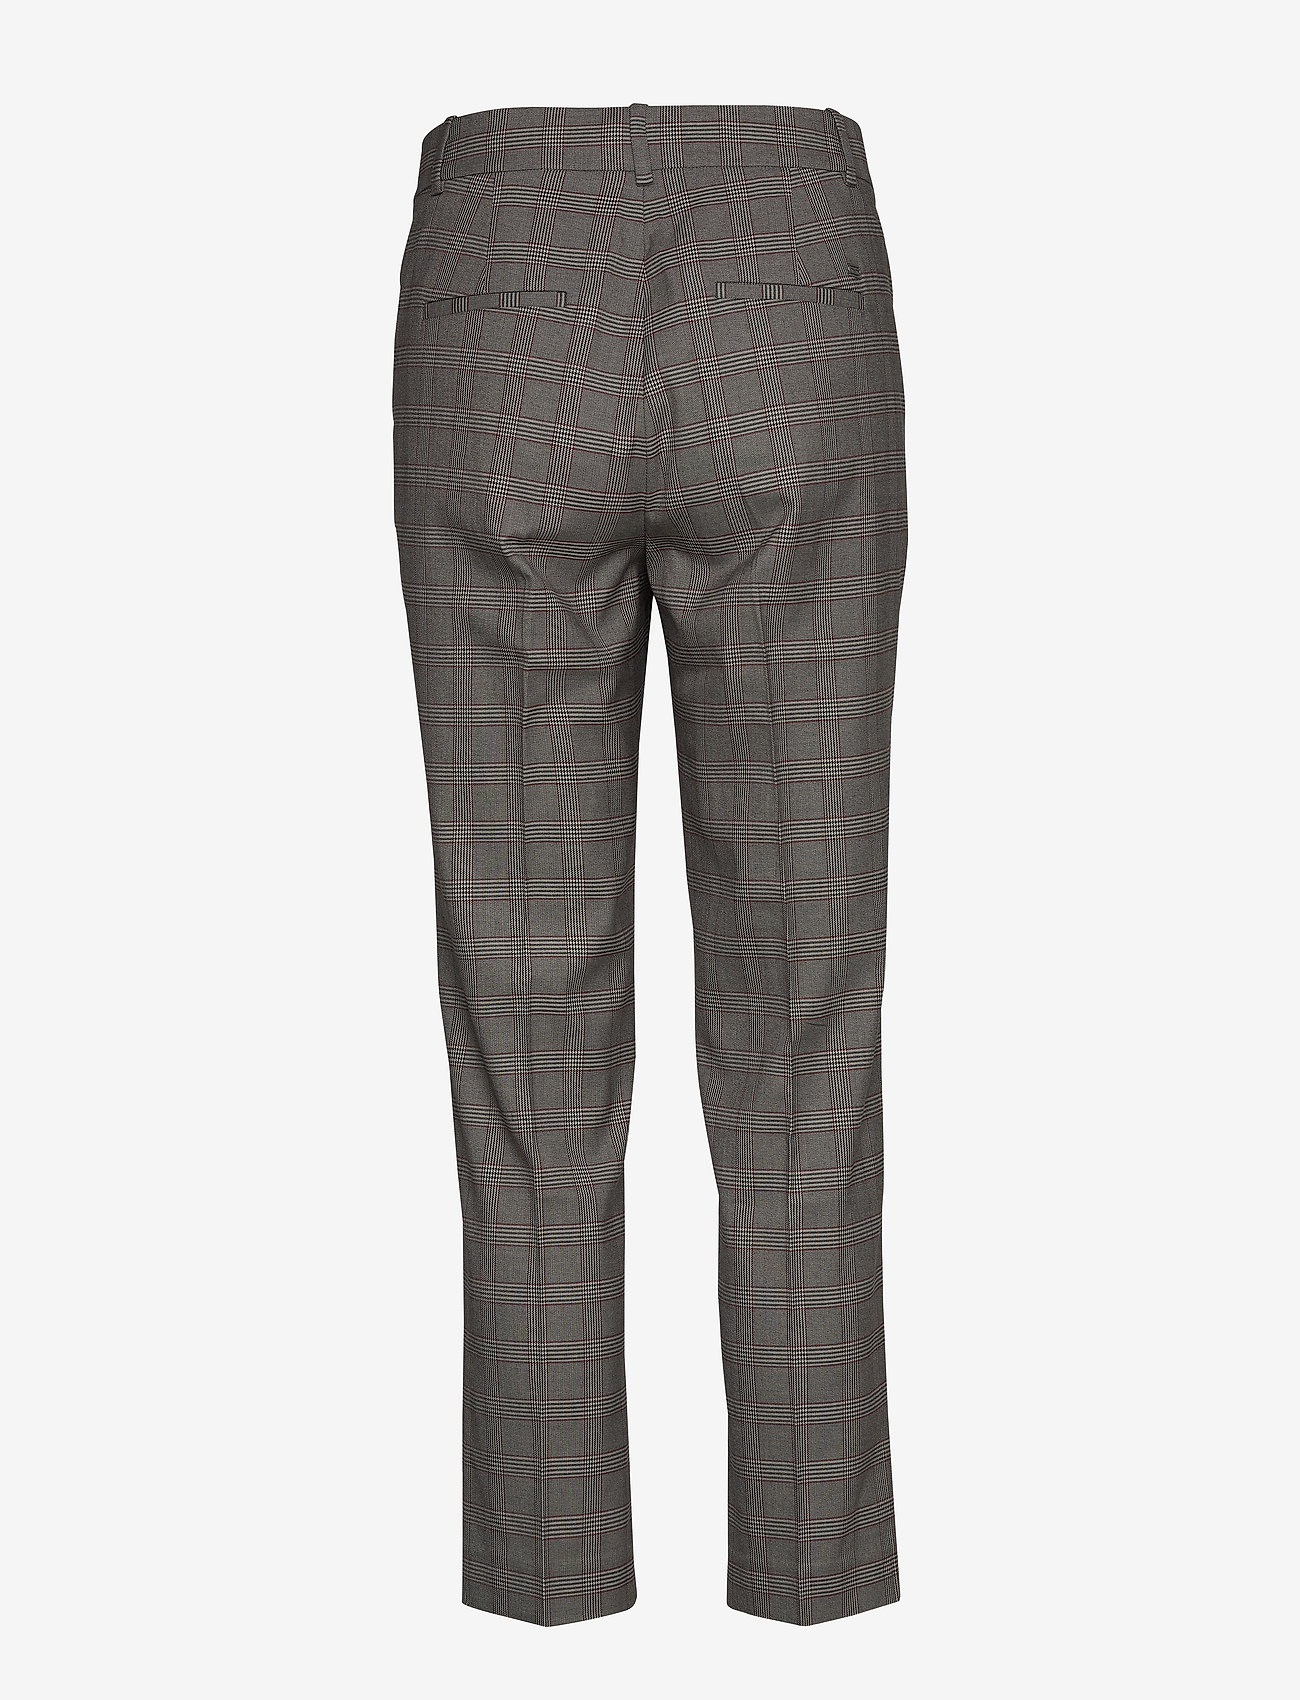 Tommy Hilfiger - Y/D POW CHECK SLIM AL PANT - straight leg trousers - cw check black small scale - 1